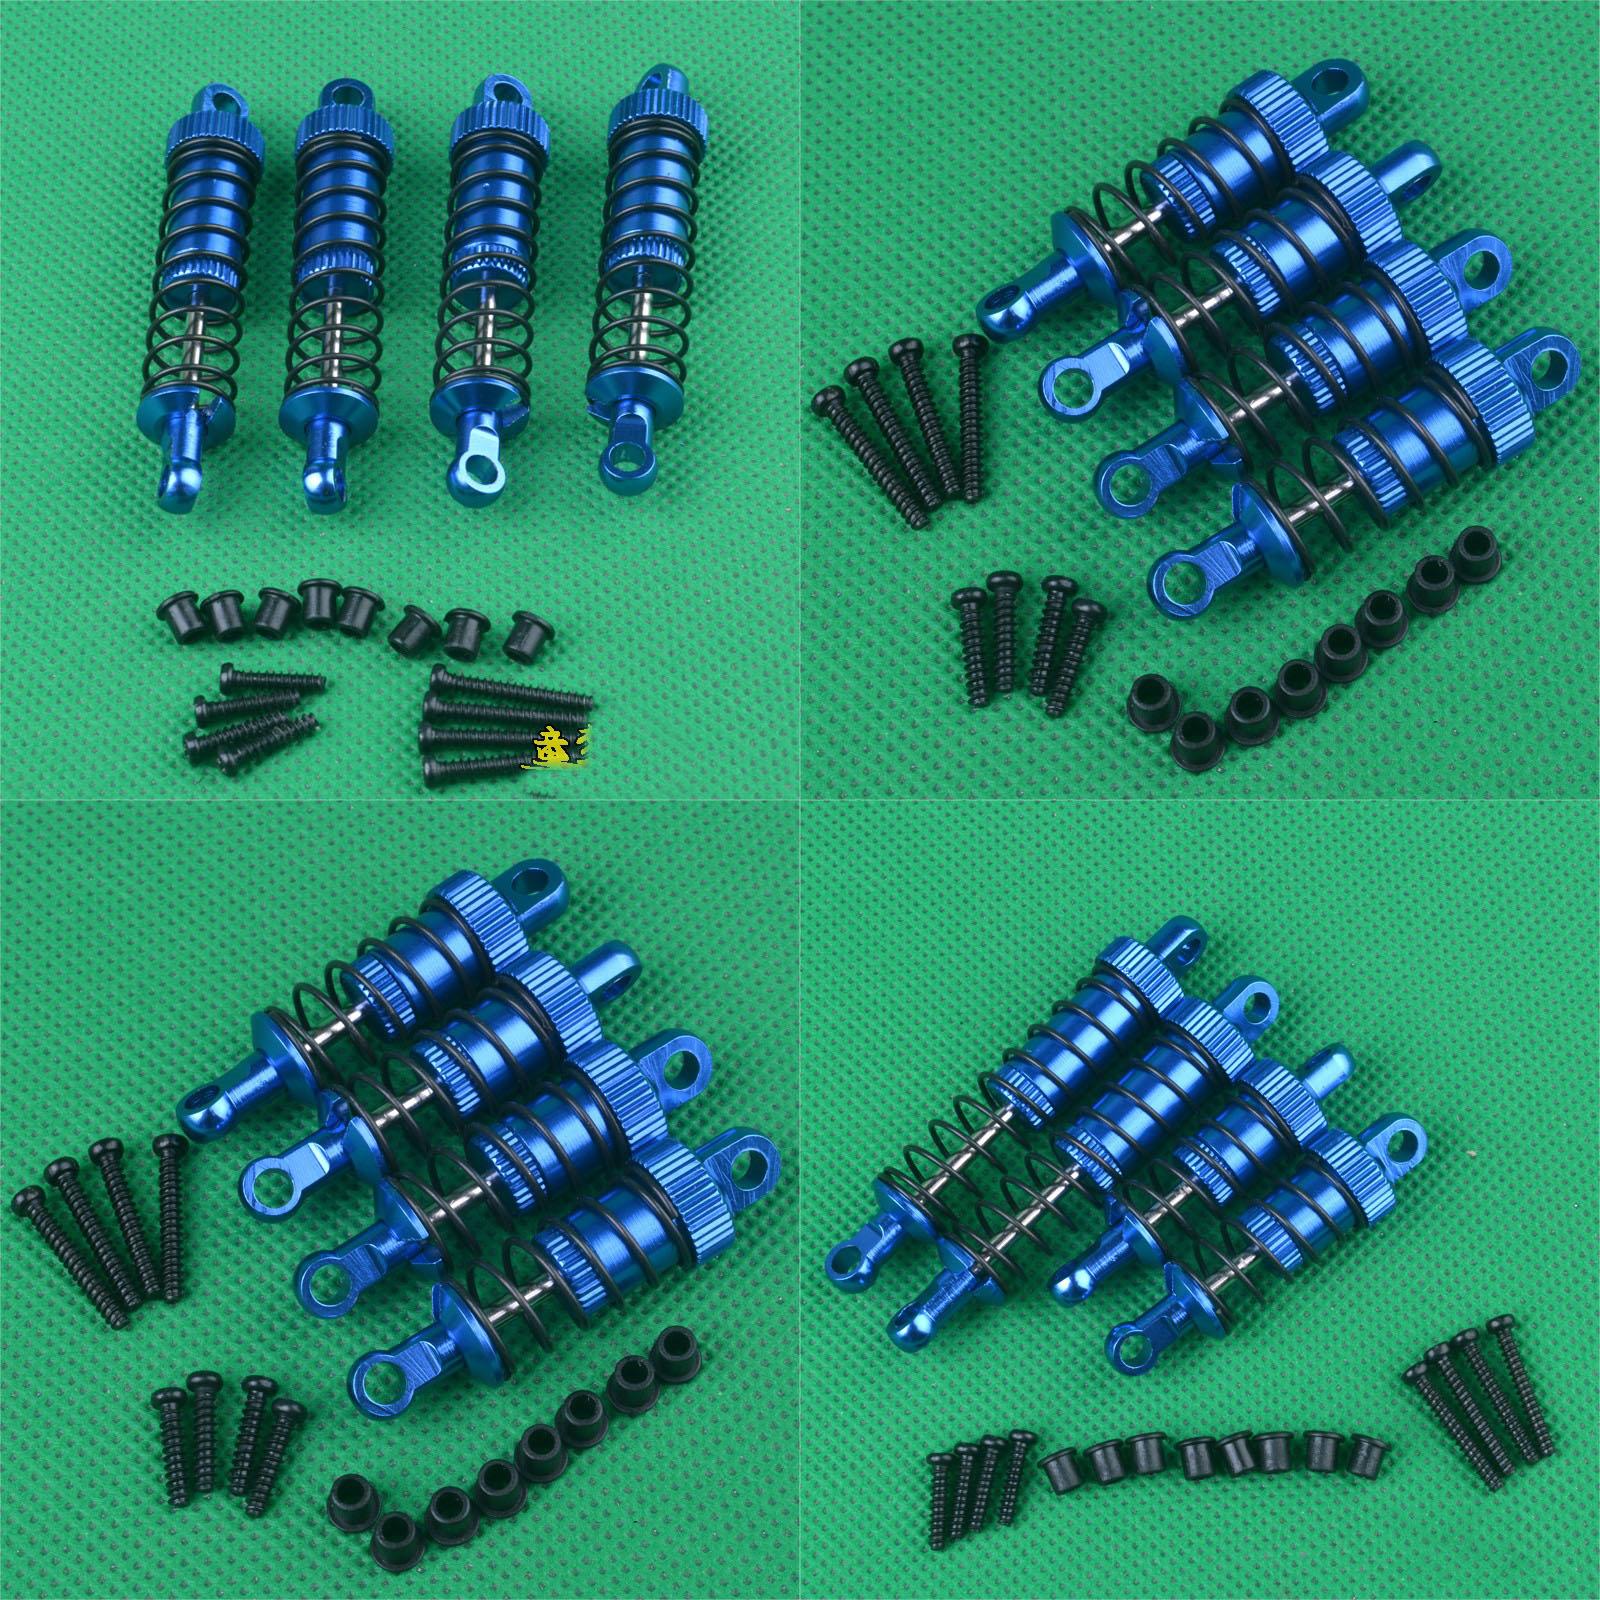 4Pcs Metall blau Differential Cup für 1//18 A979 B K929 B RC Buggy Ersatz